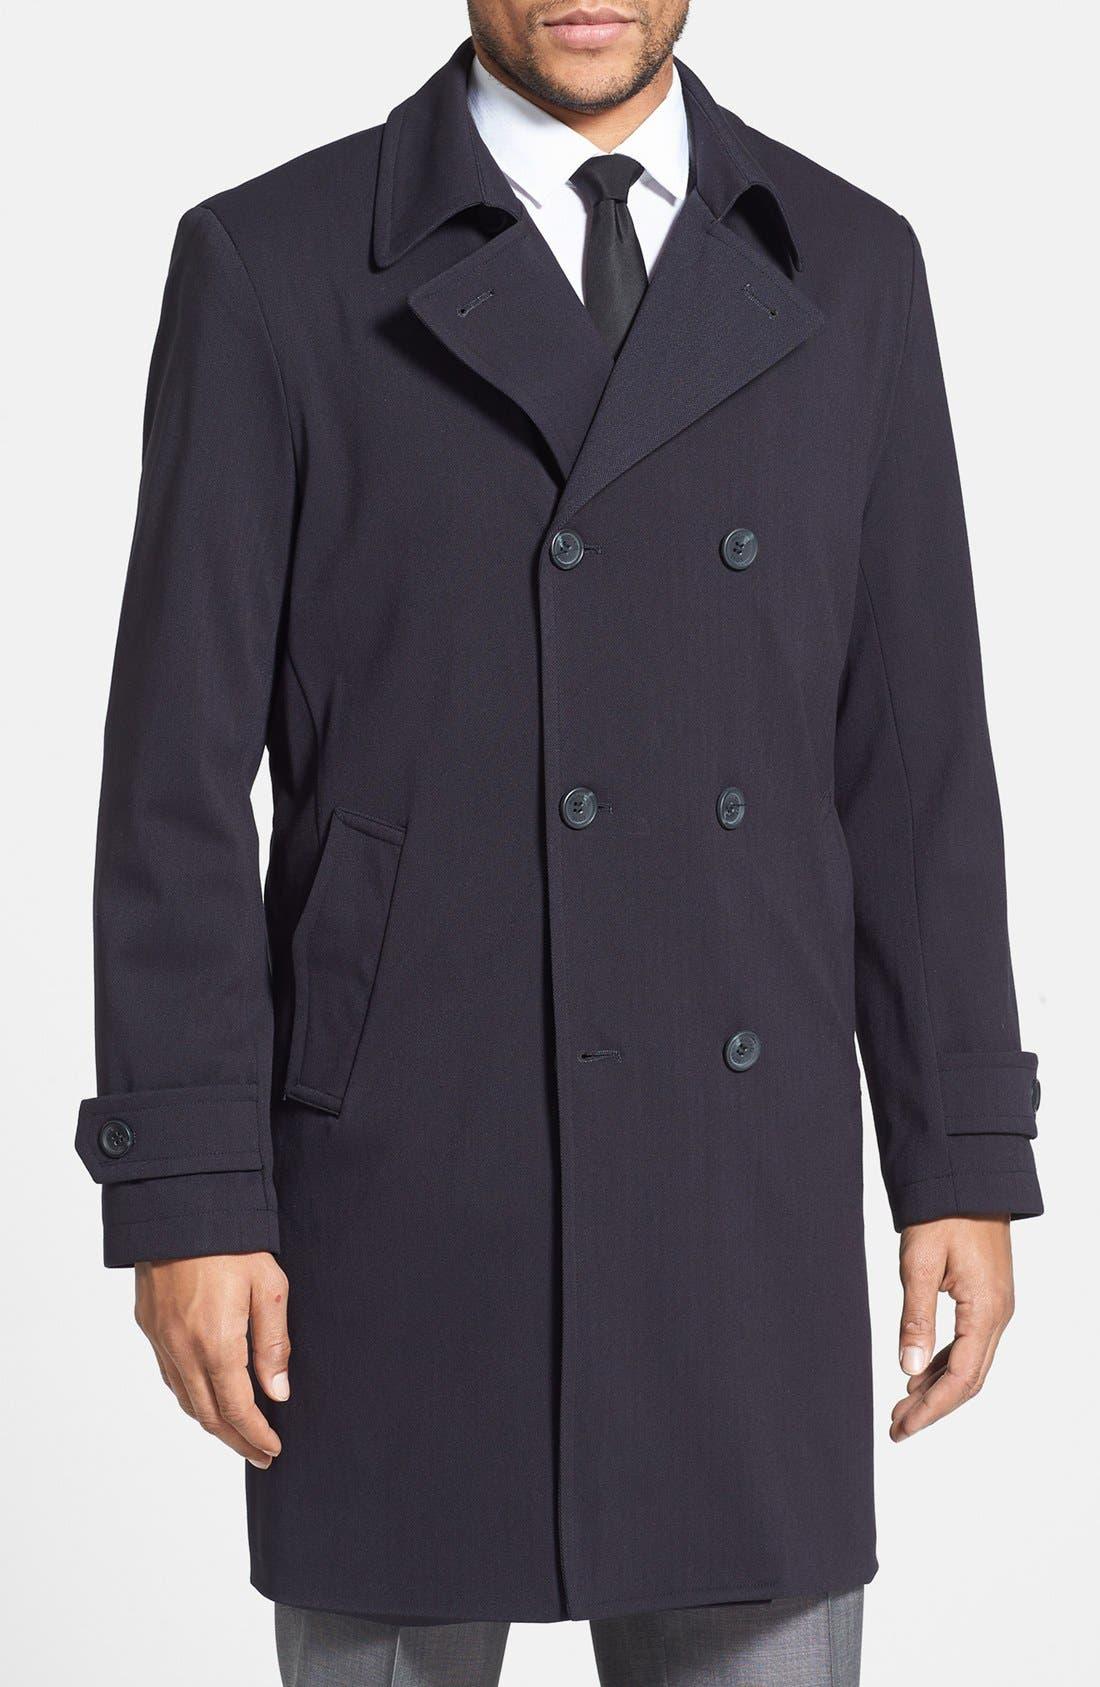 Main Image - Michael Kors 'Laz' Waterproof Double Breasted Topcoat